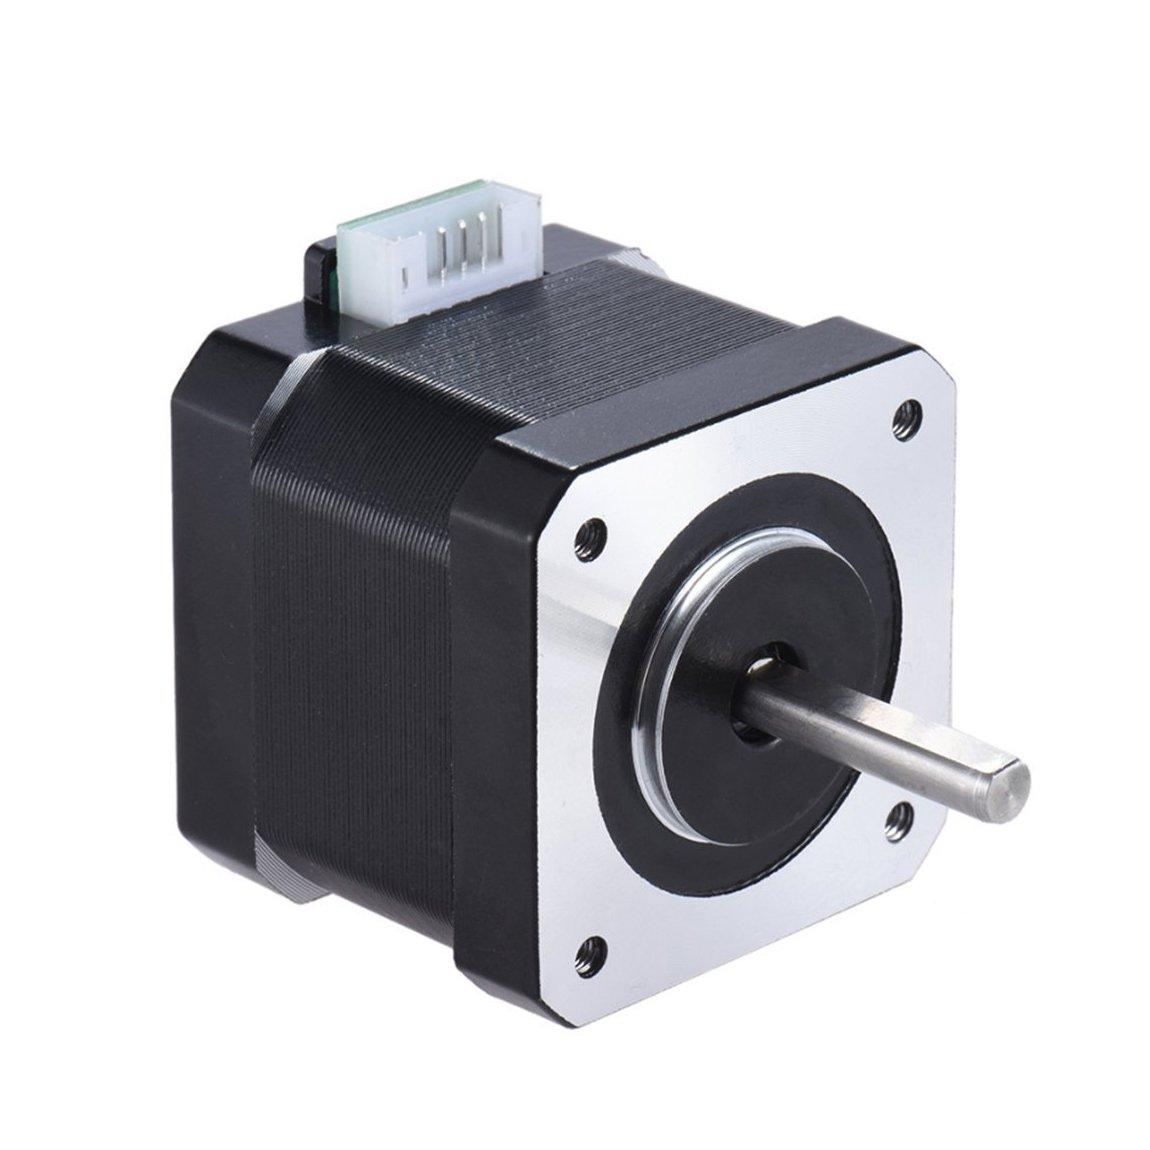 JoyNano Nema 17 Stepper Motor Bipolar 1.7A 40N.cm Holding Torque 2-Phase 4-Wire 1.8 Deg 40mm Body for 3D Printer Or CNC Machine